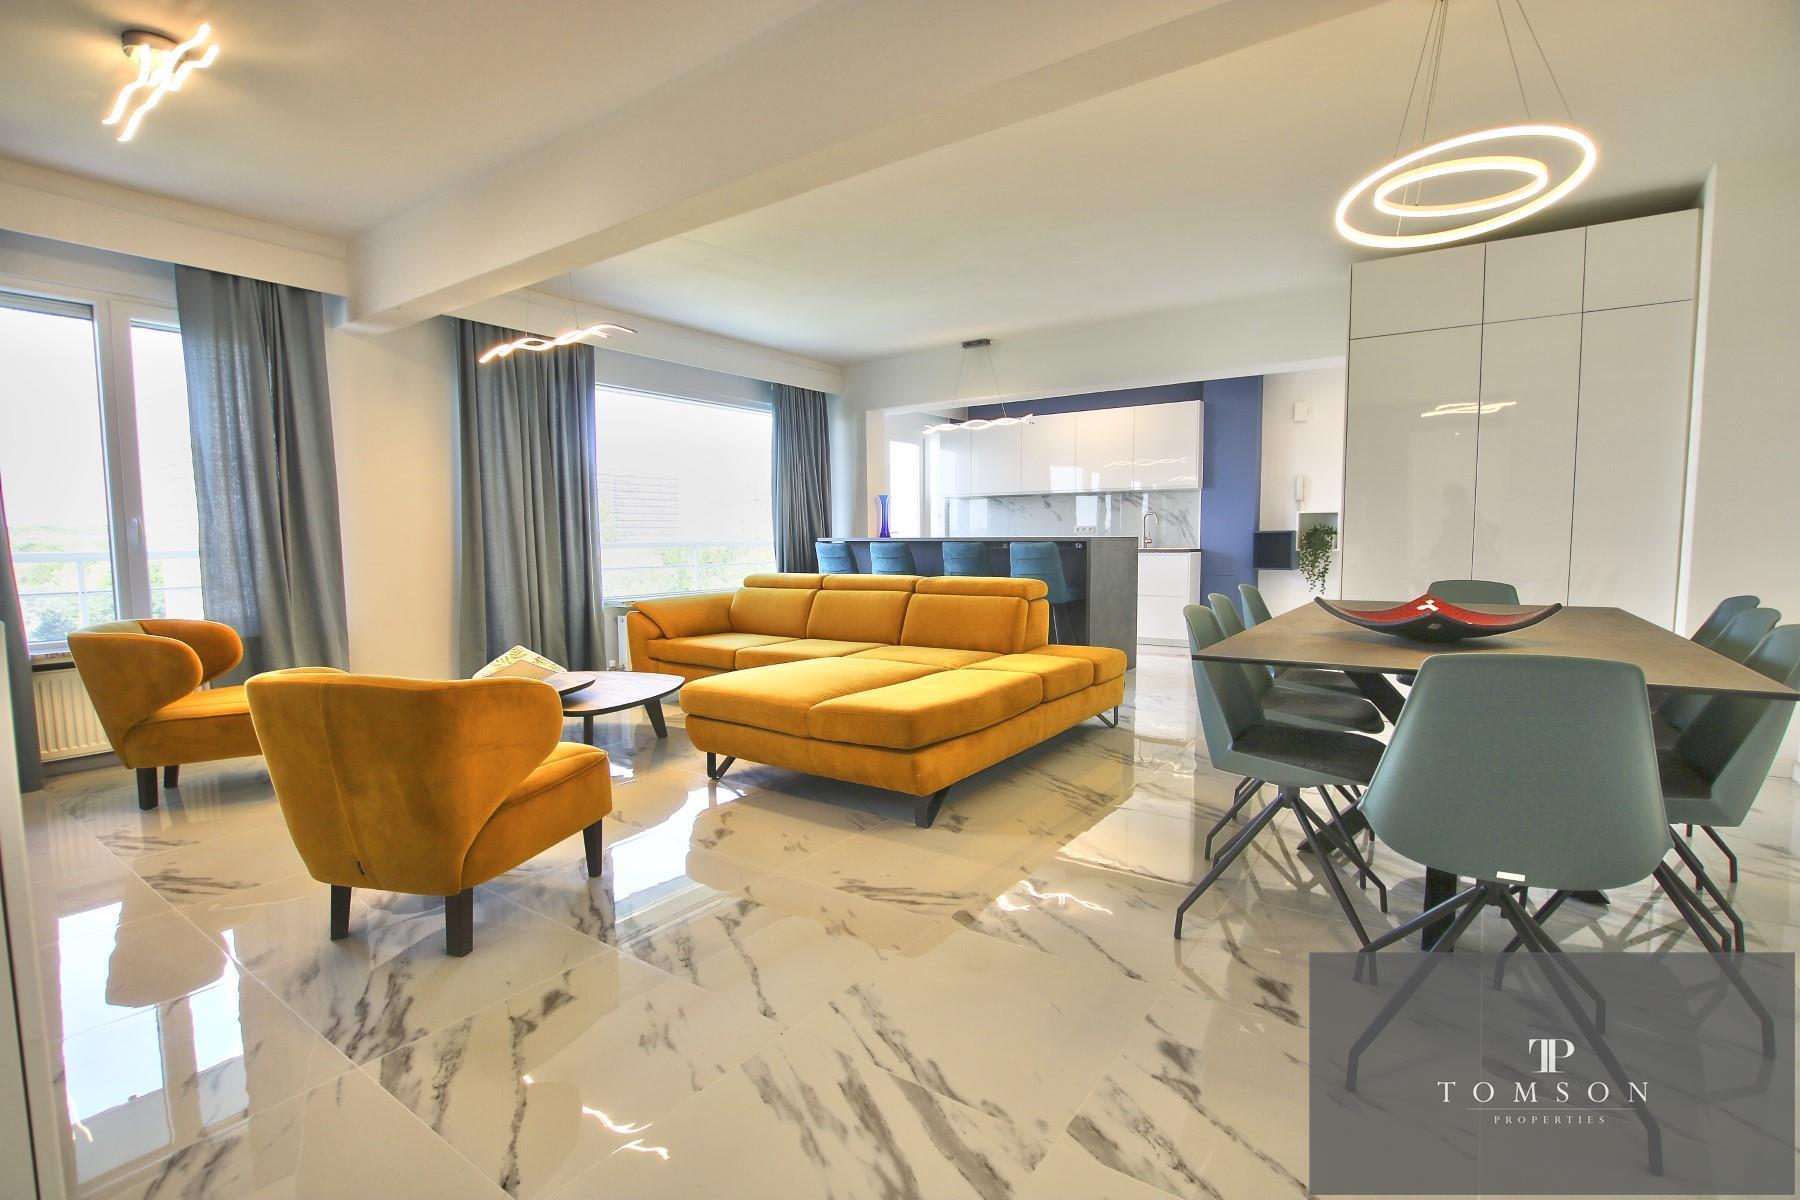 Appartement - Woluwe-Saint-Lambert - #4530510-0